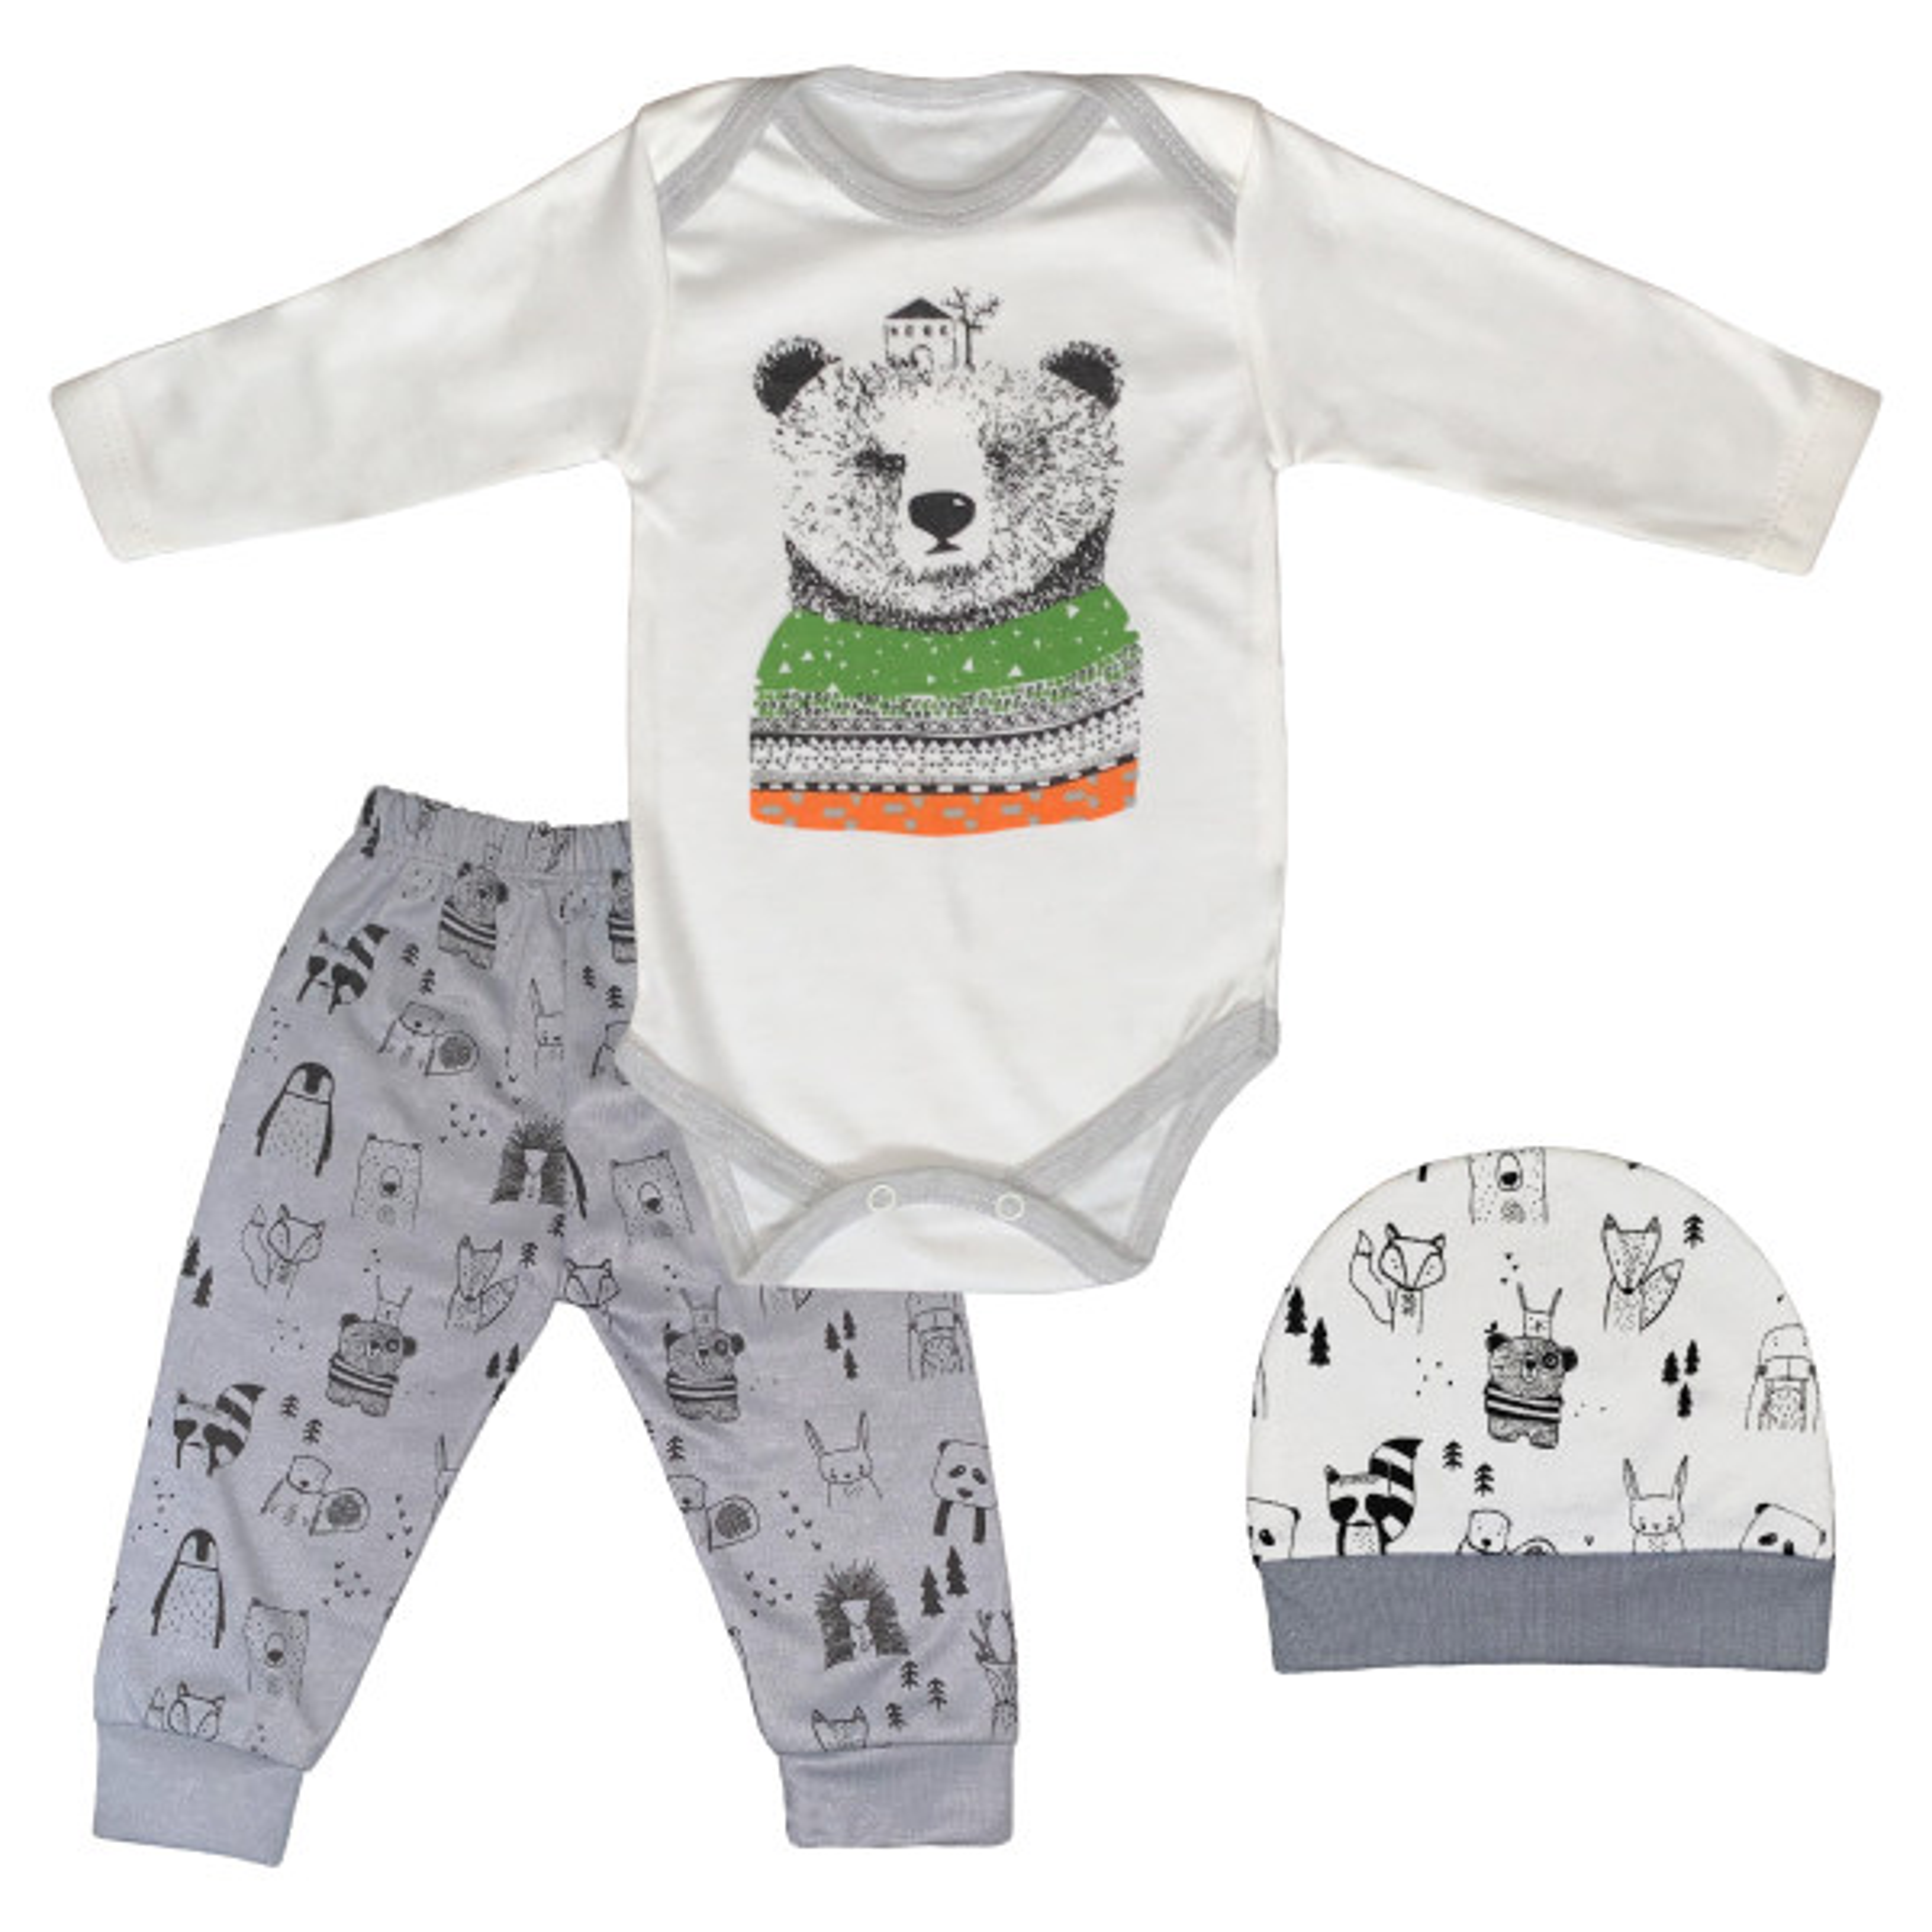 ست 3 تکه لباس نوزادی طرح پاندا کد FF-139